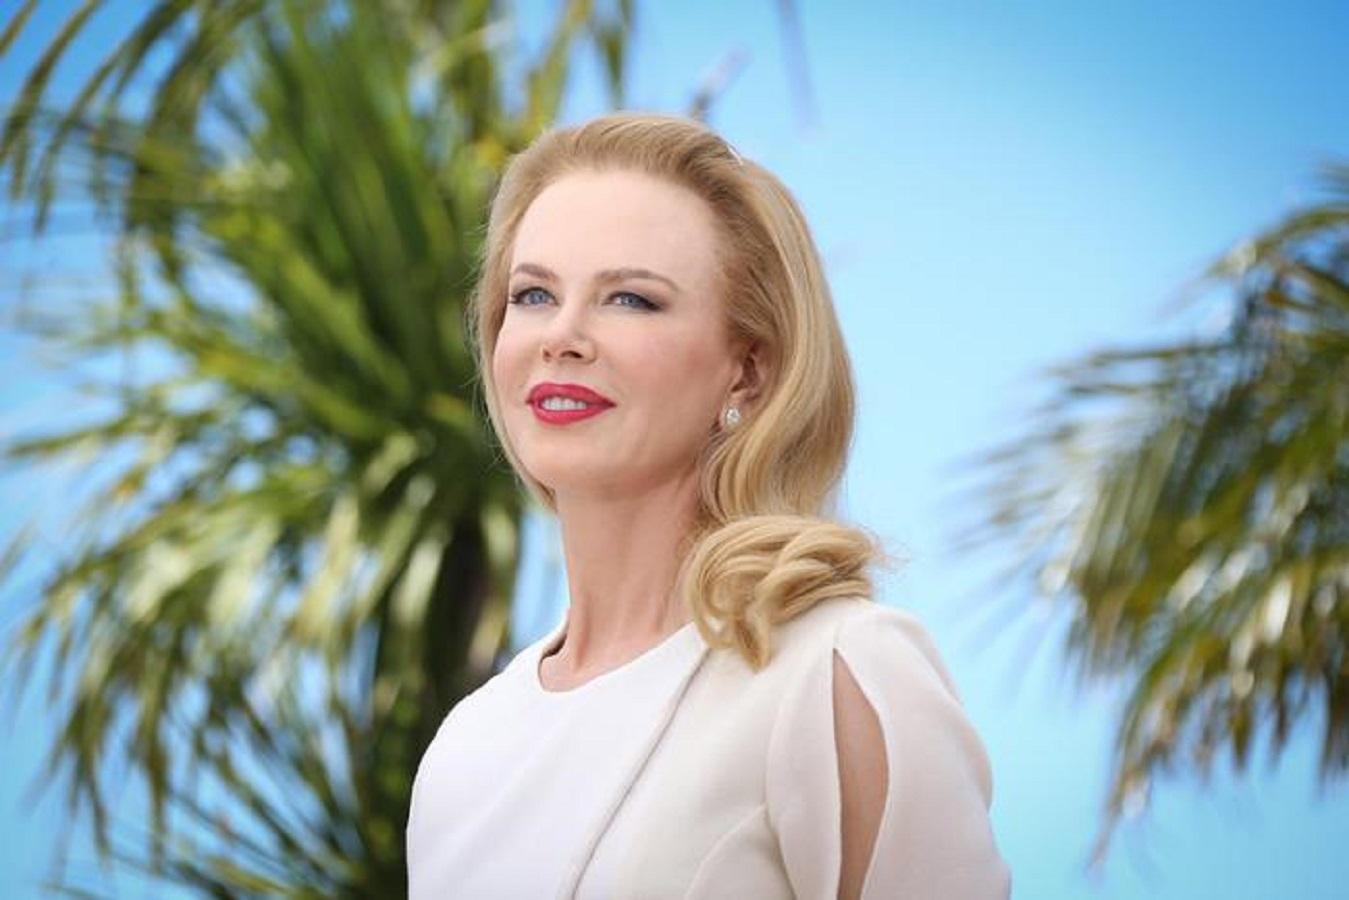 Nicole Kidman, dal tè matcha al retinolo: 6 segreti di bellezza